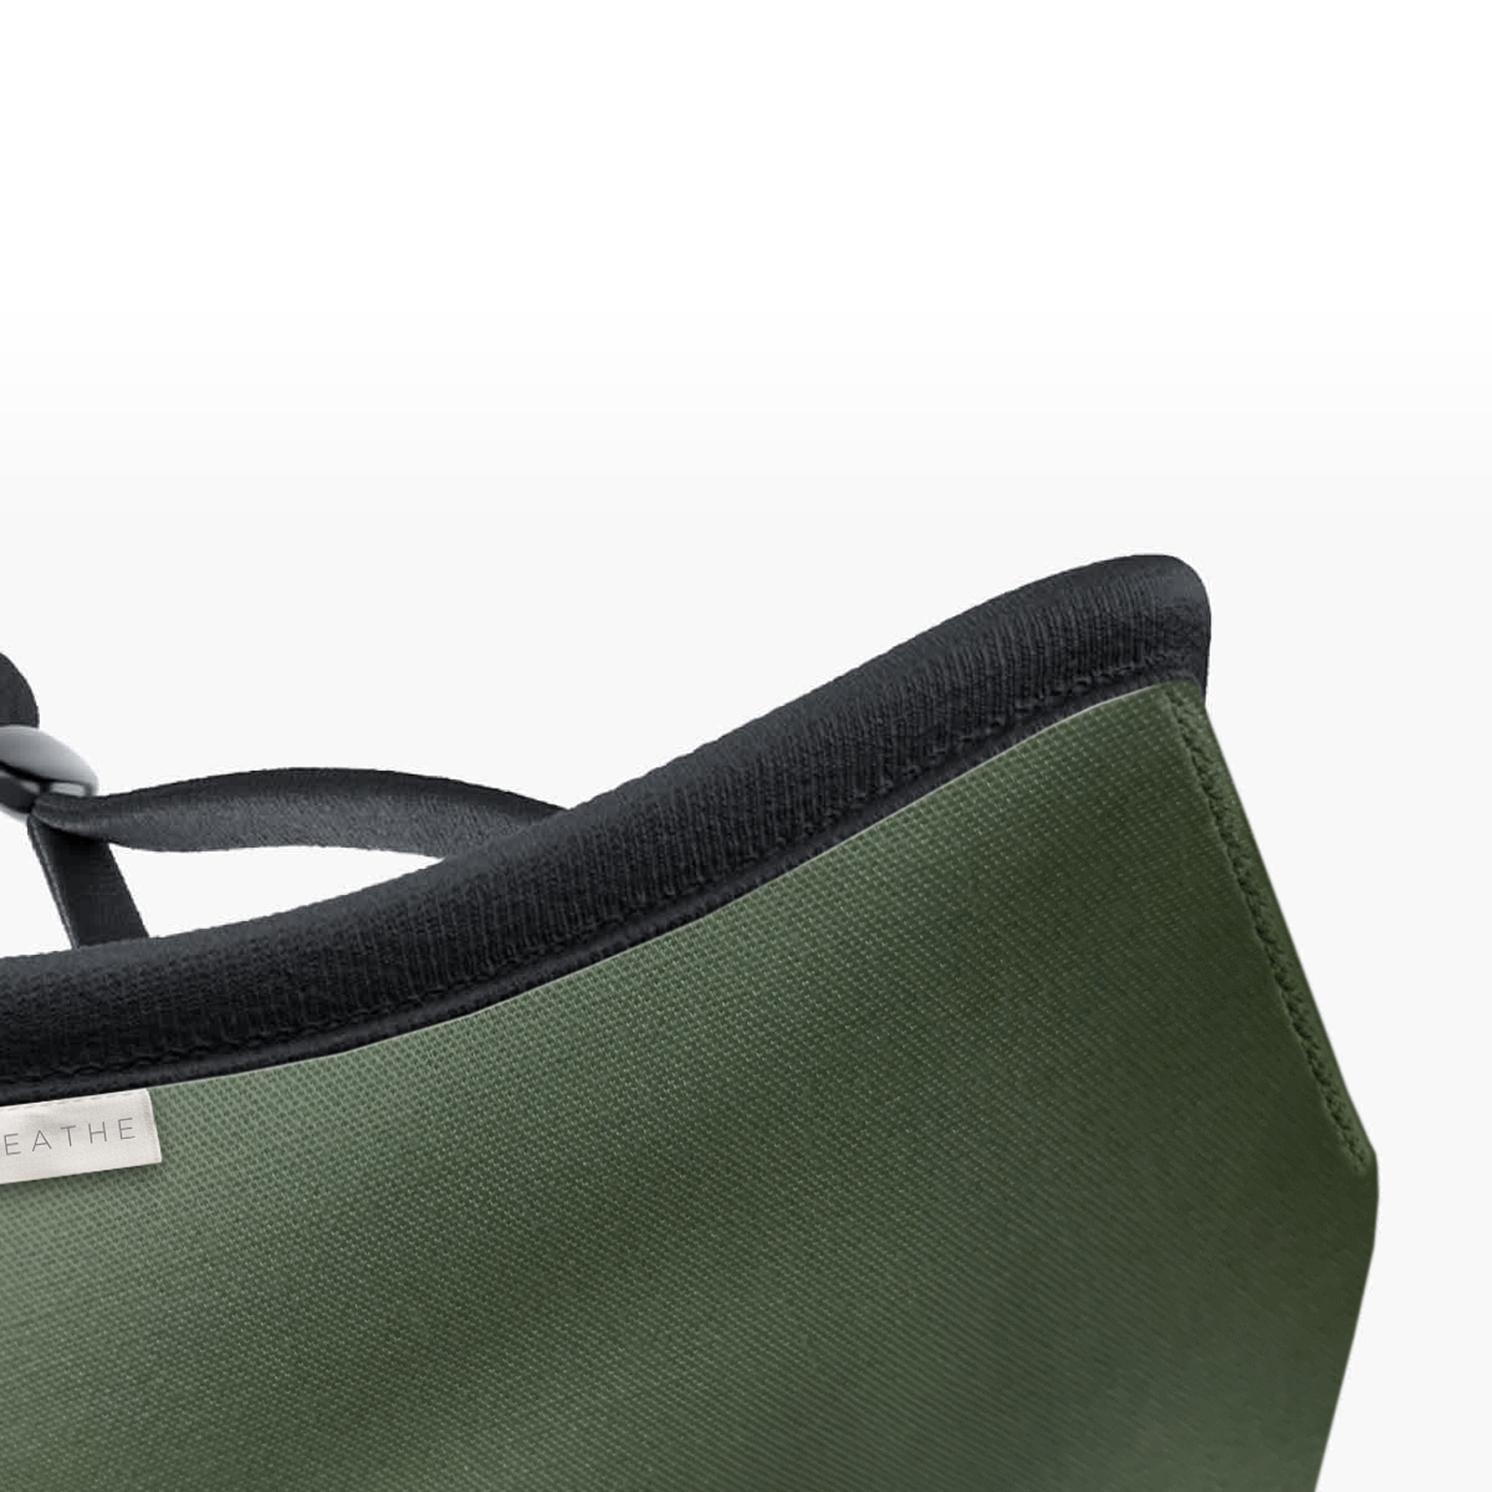 Breathe – Children's Khaki 5-Layered Reusable Organic Cotton Face Mask in Bag